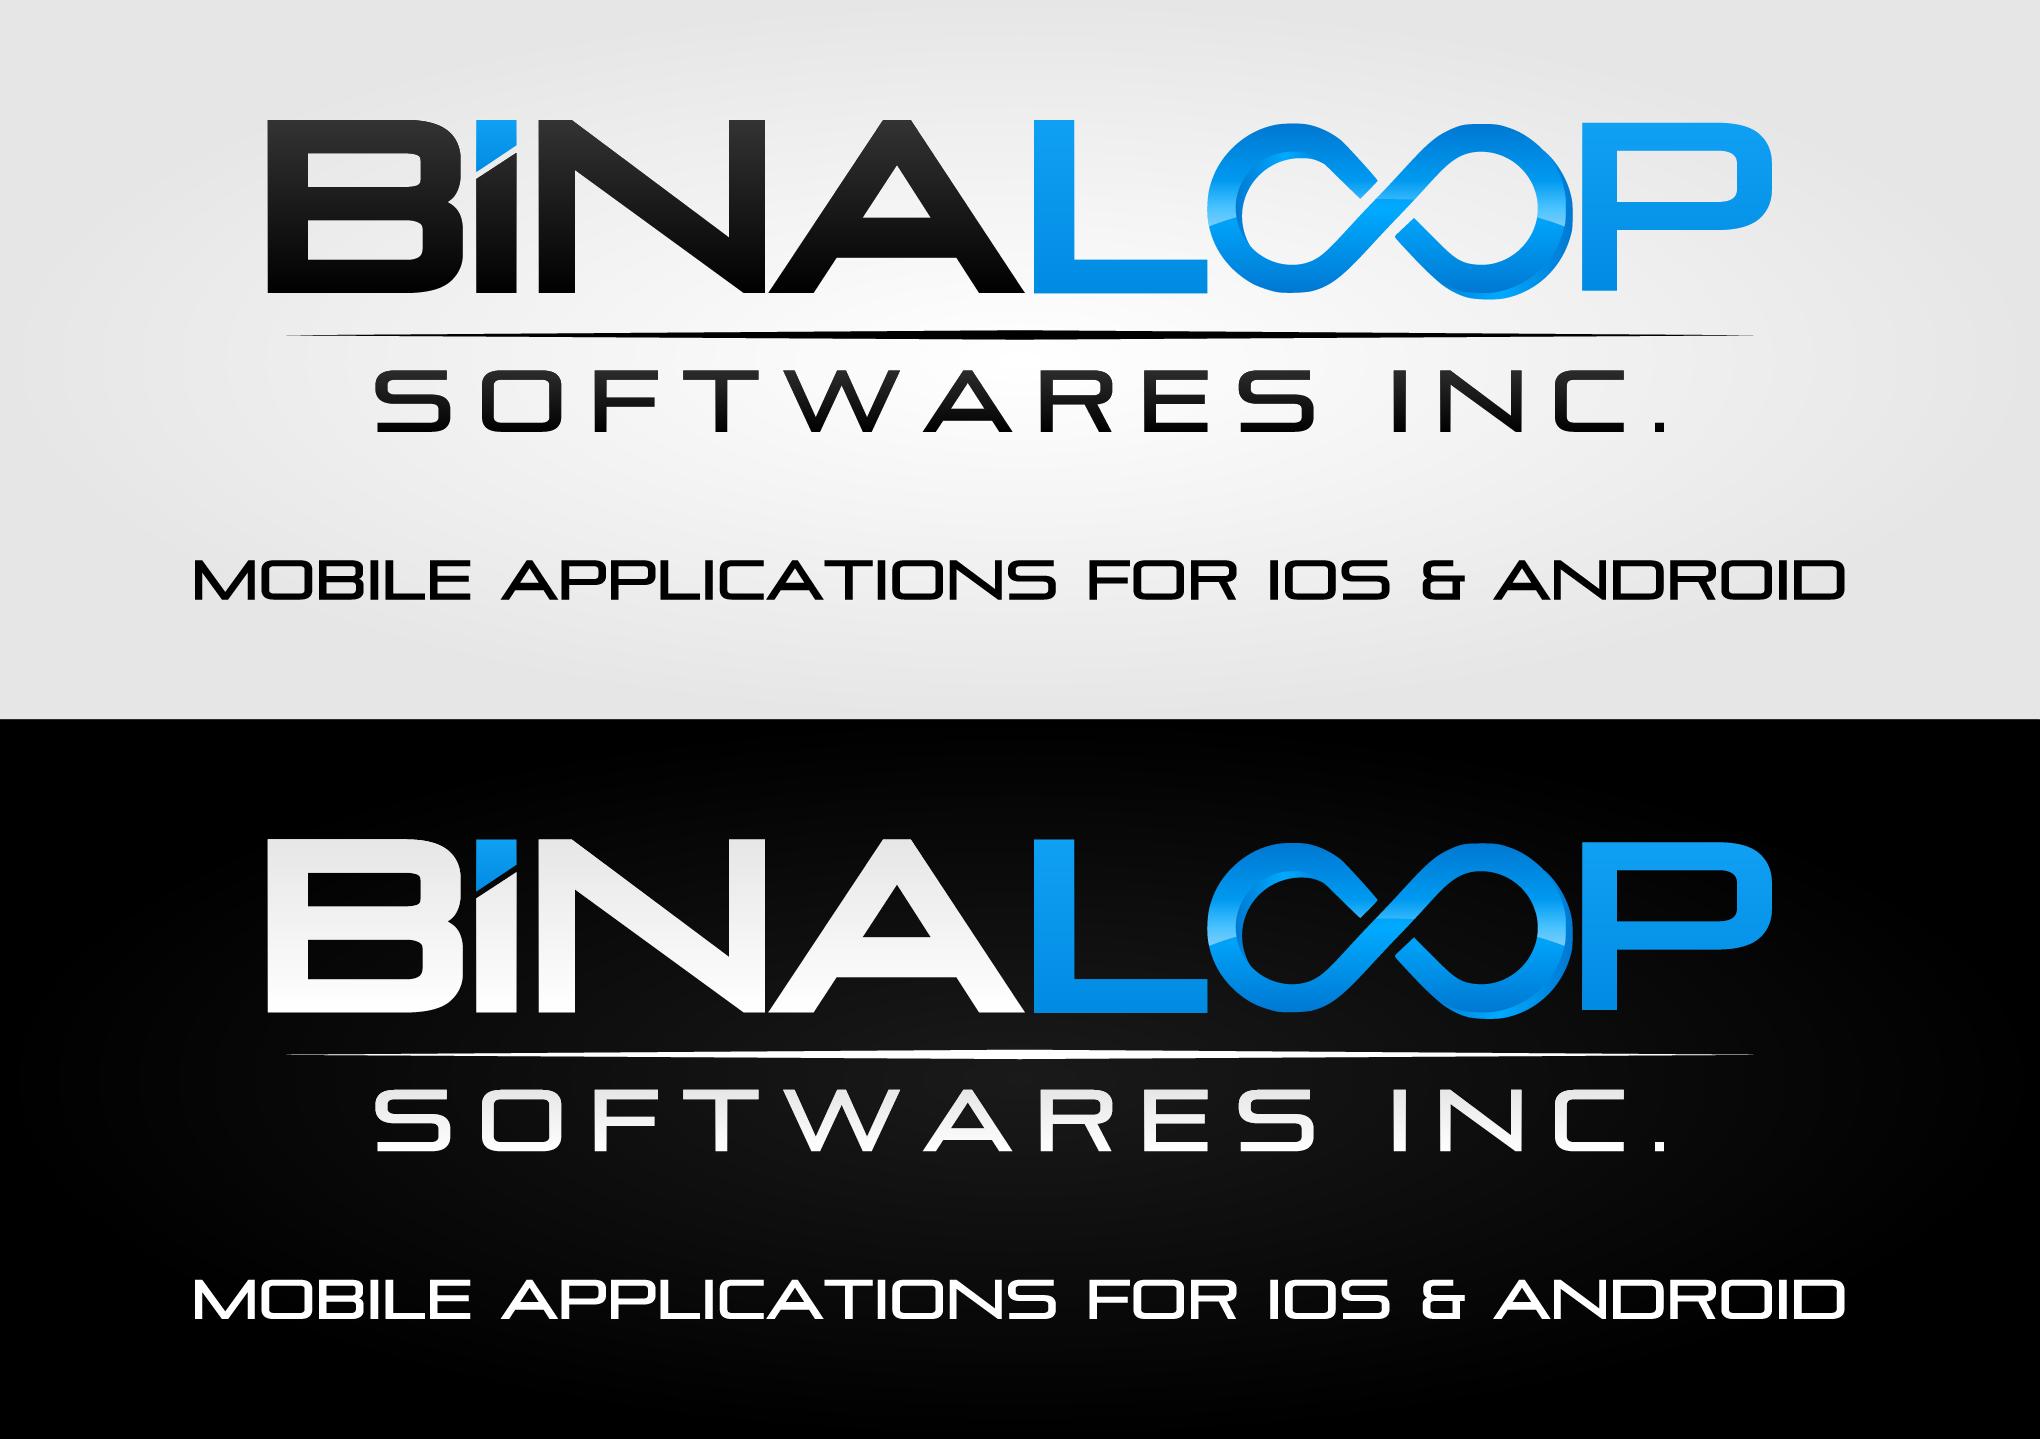 New logo wanted for Binaloop Softwares Inc